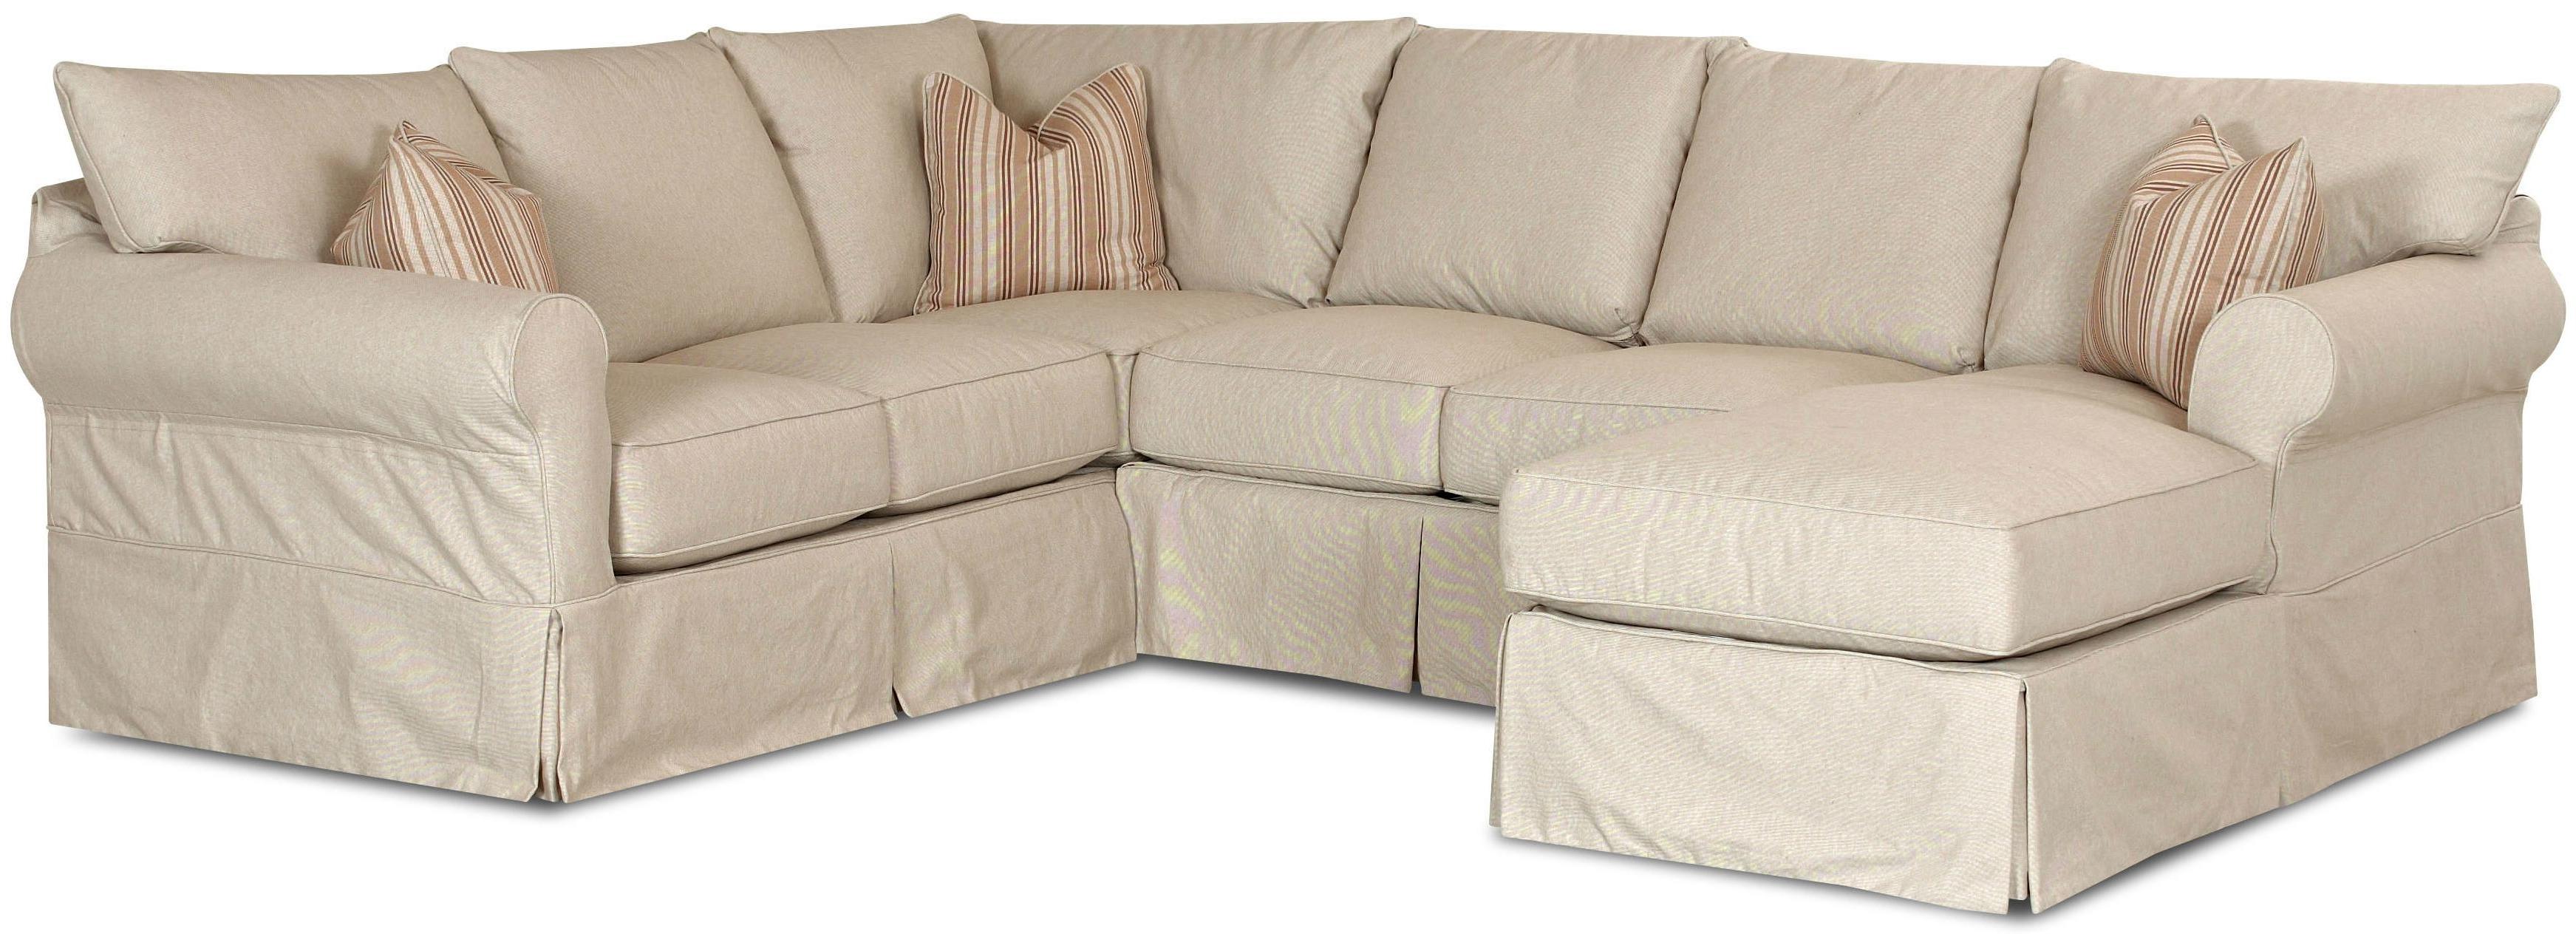 Sofa Slip (View 9 of 15)